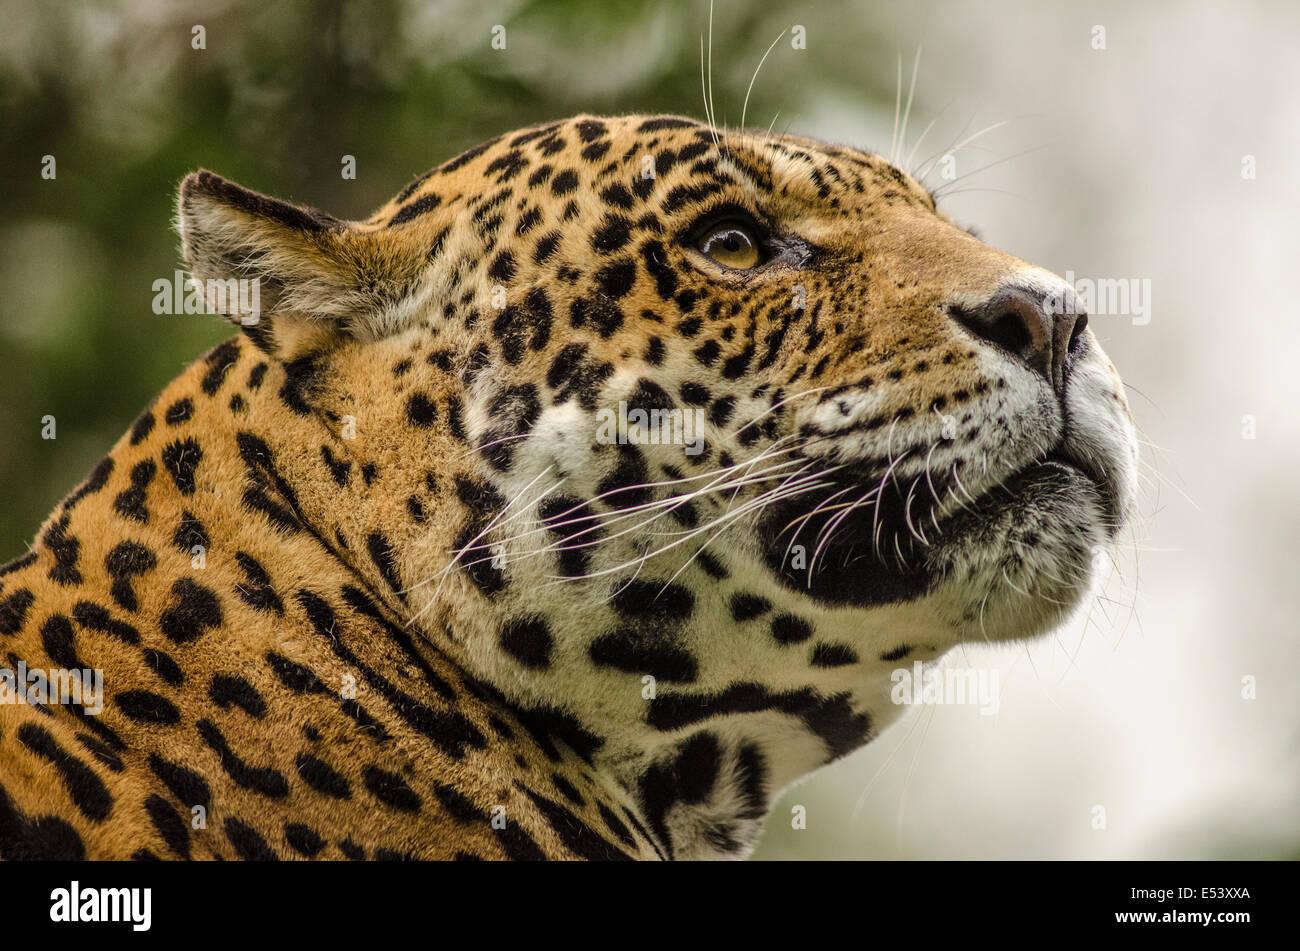 Jaguar Stockbild